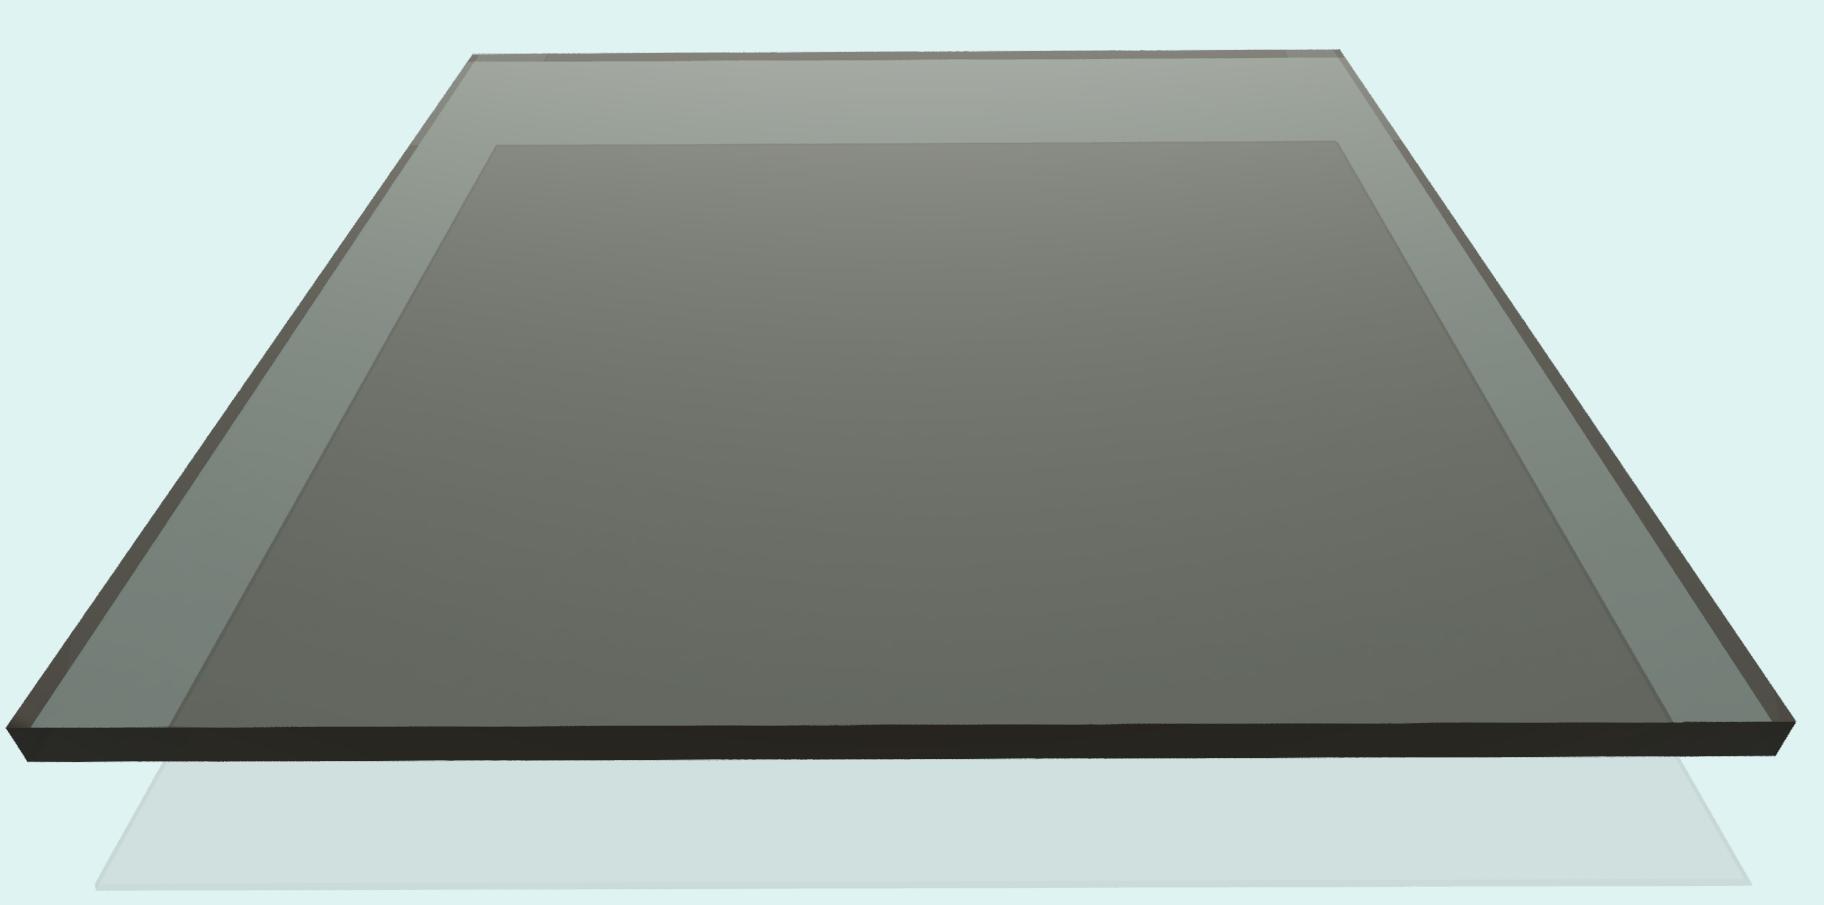 Polycarbonat 6mm, bronze / braun 851